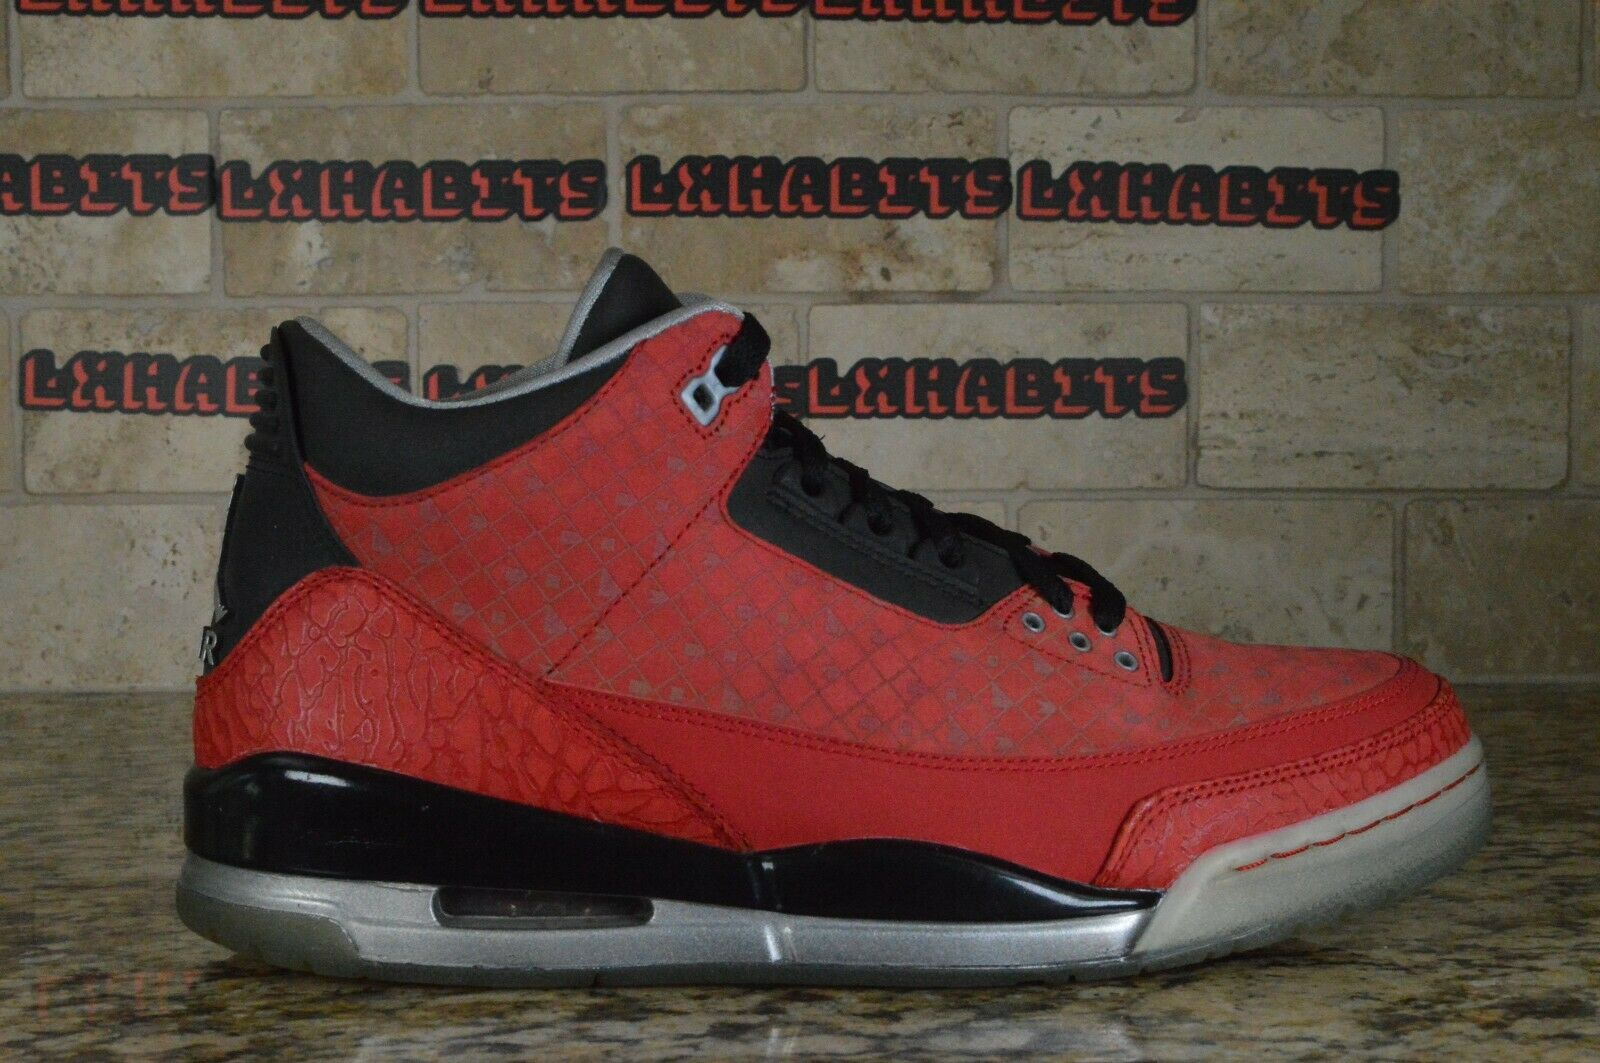 Doernbecher Db 437536 600 Size 10.5 Red